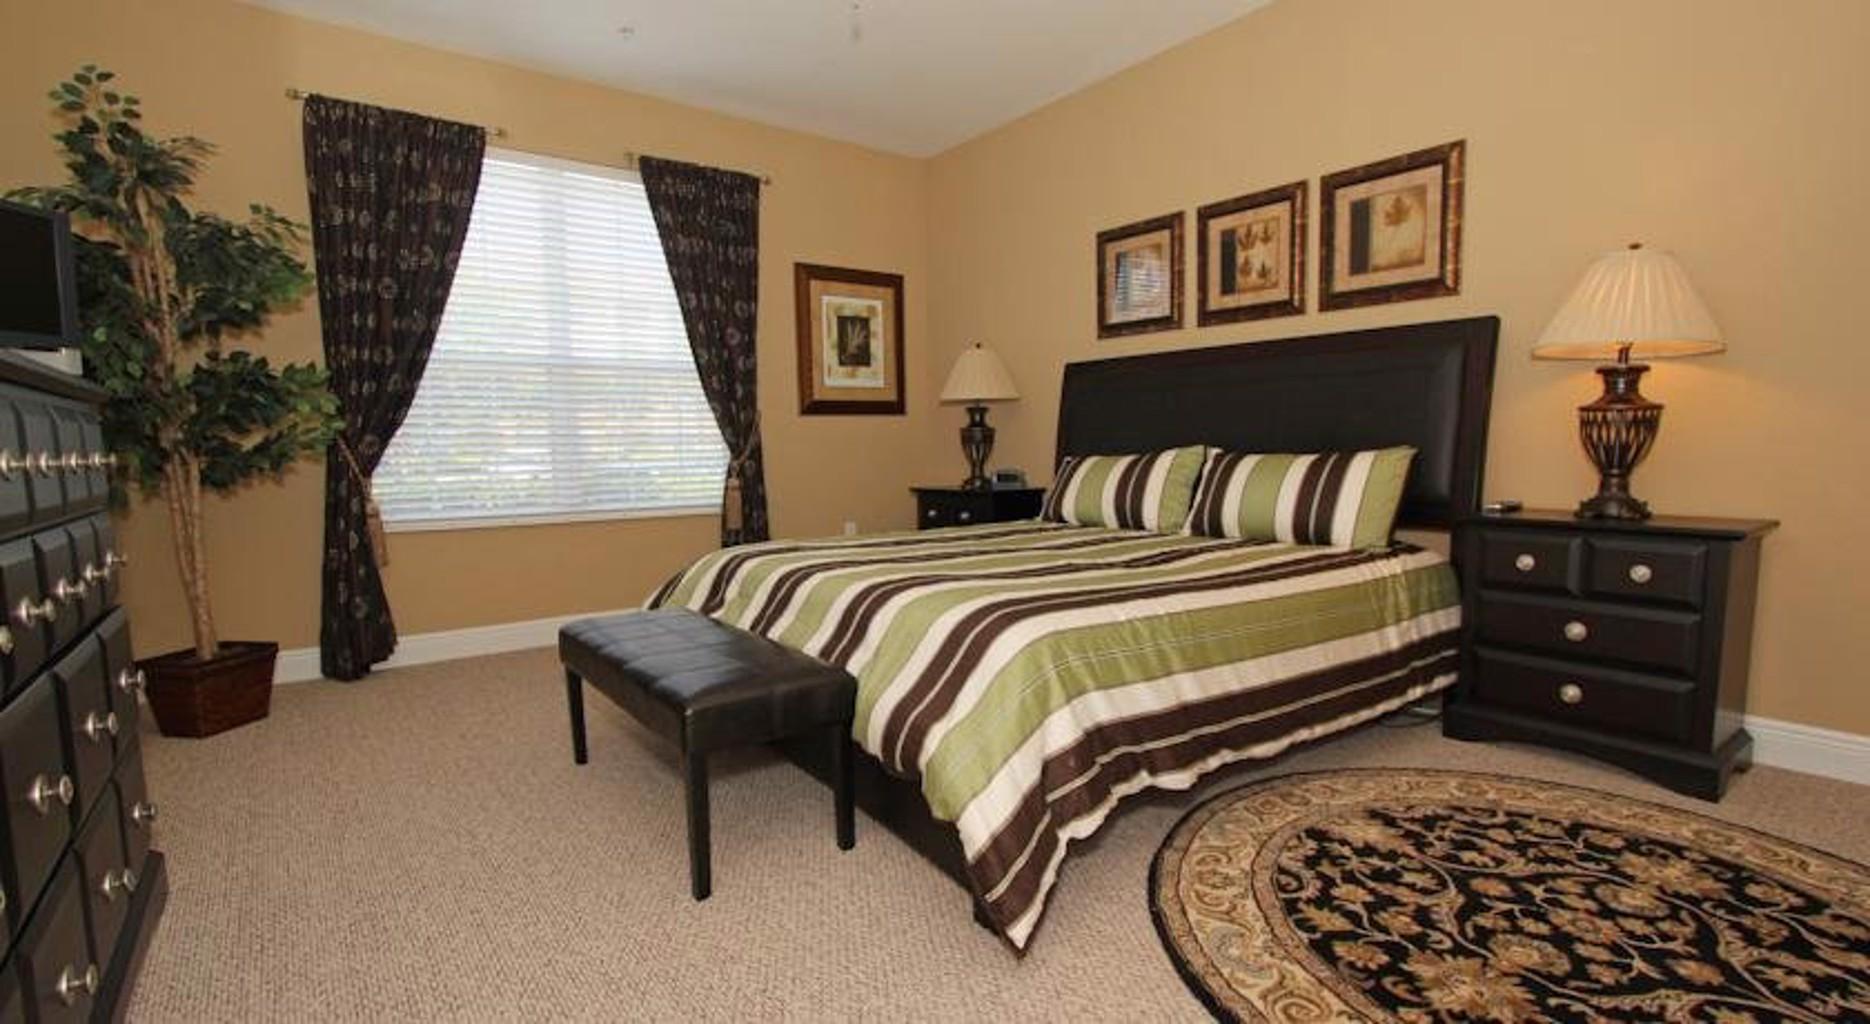 Global Resort Homes & Condos